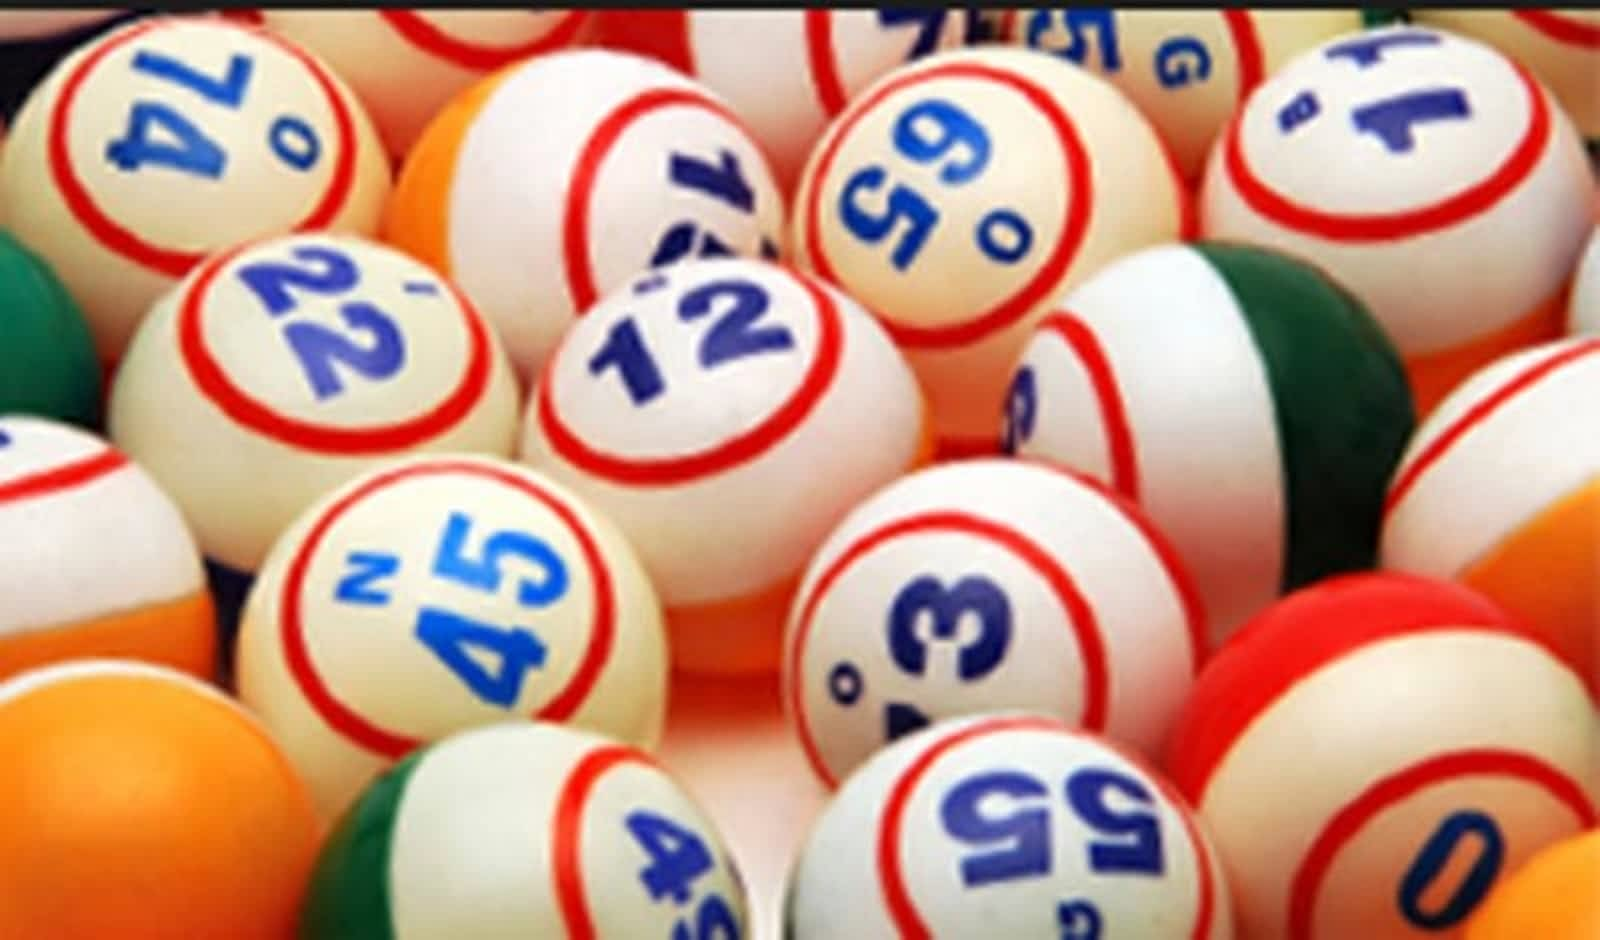 Chances casino kamloops entertainment casino